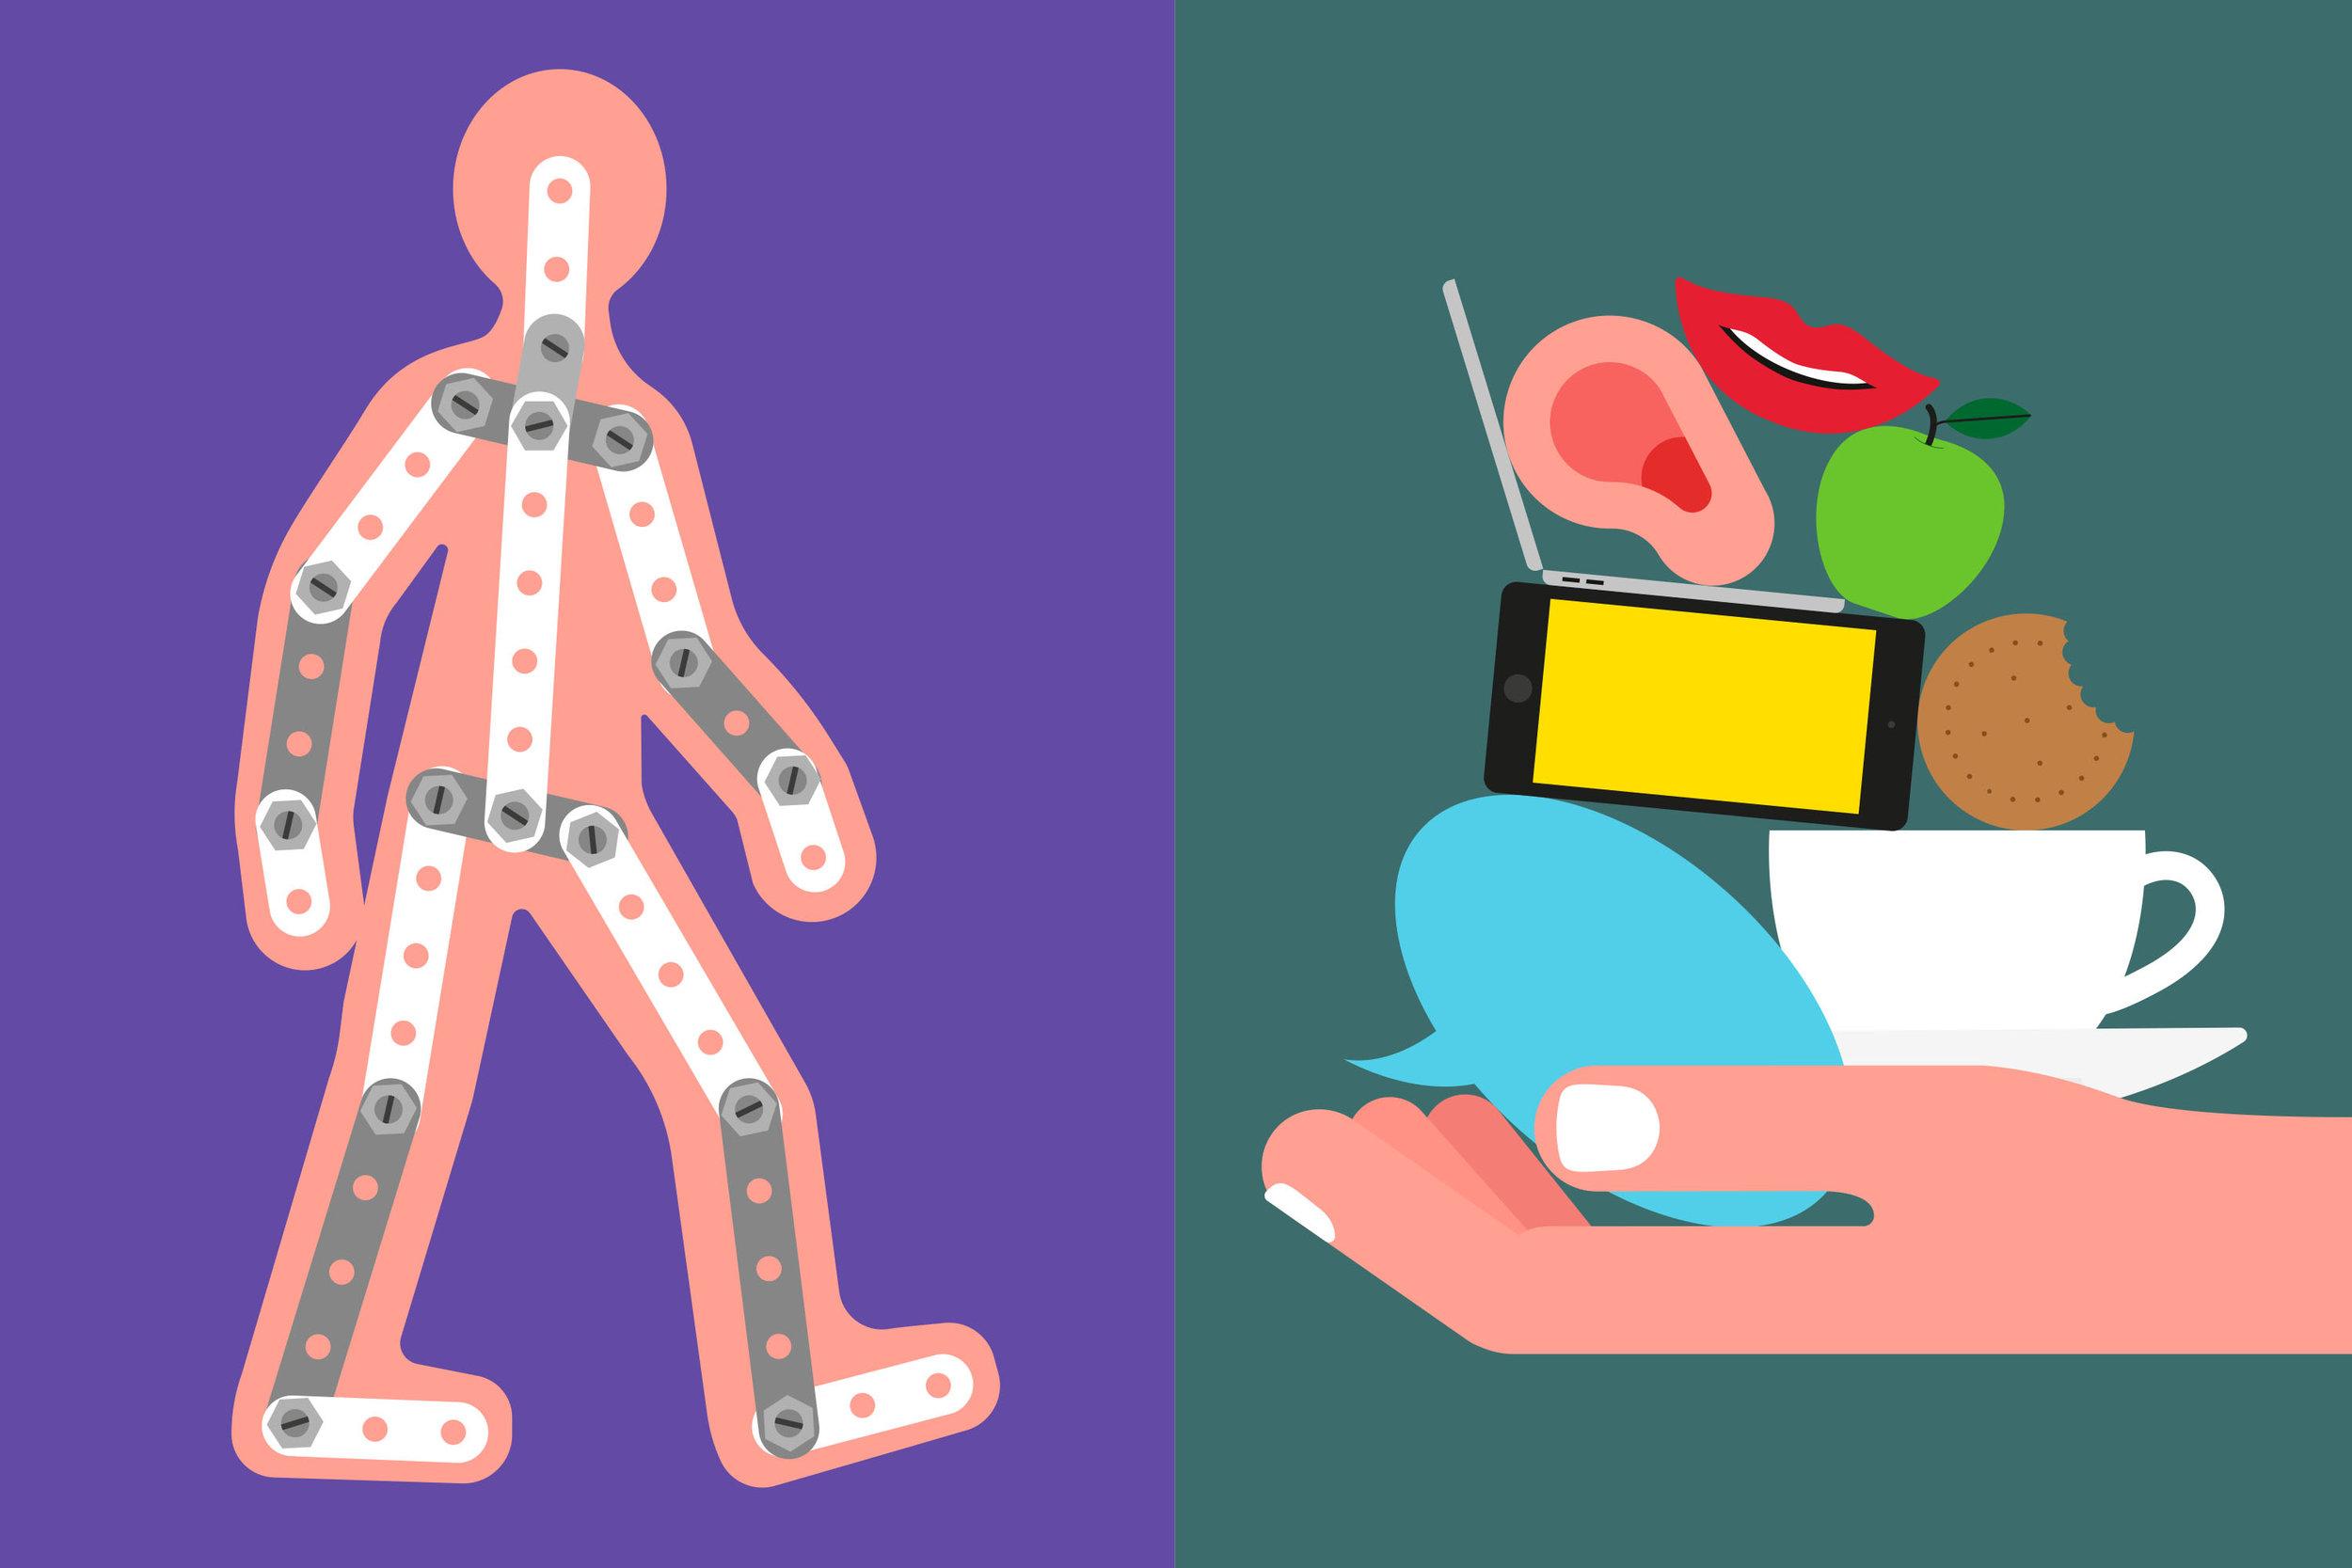 Re_Versus-arthritis_IllustrationsArtboard 1 copy 3.jpg